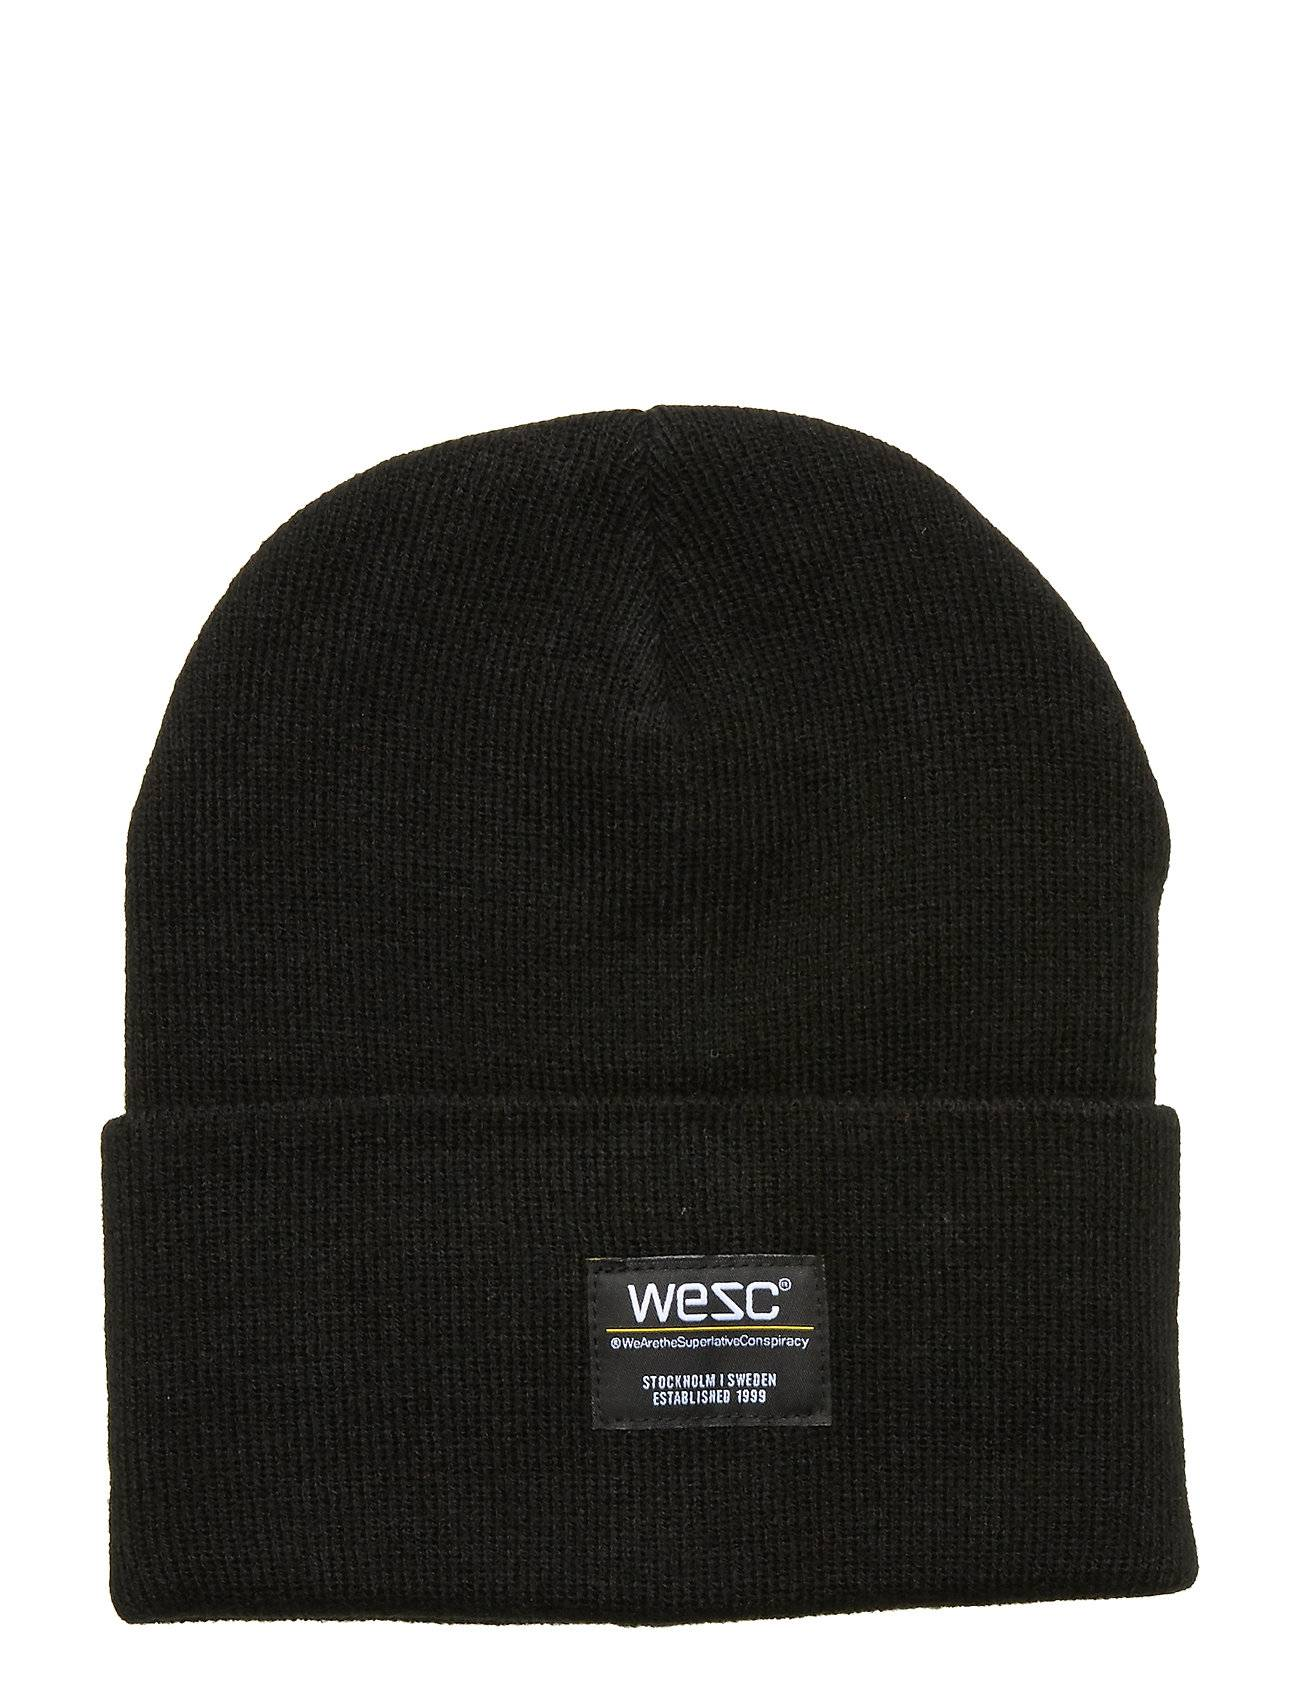 WeSC Puncho Beanie Accessories Headwear Beanies Musta WeSC